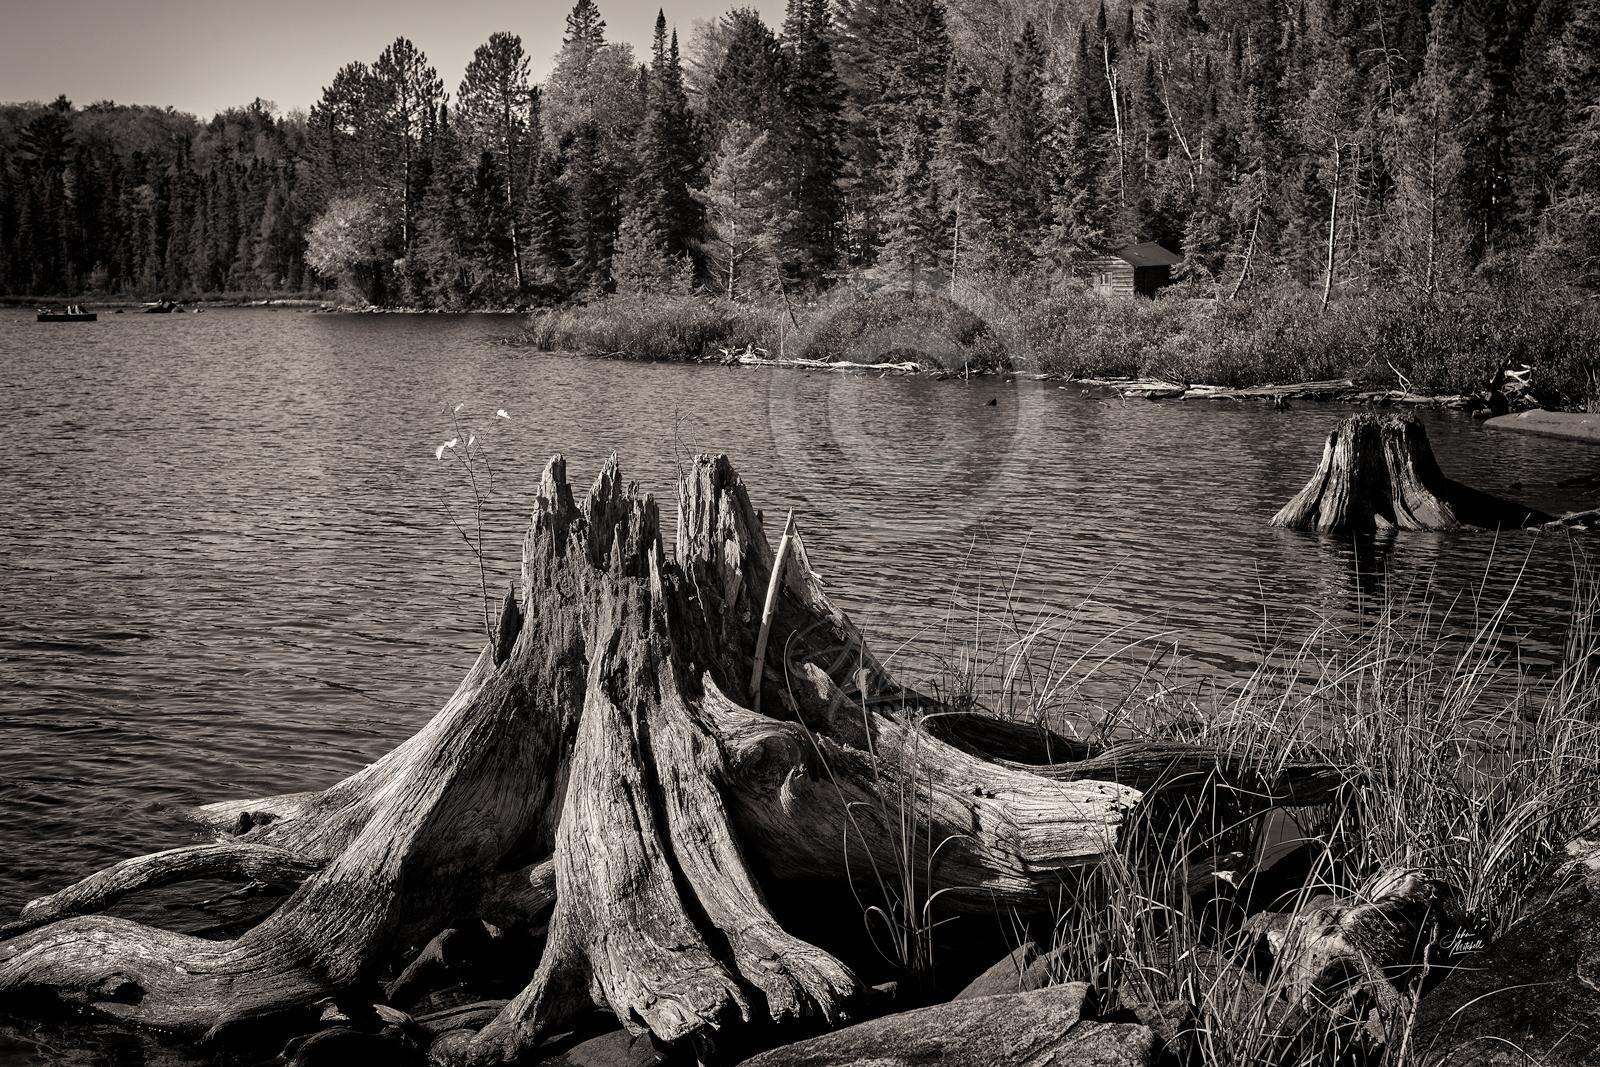 THOMSONS-CANOE-LAKE